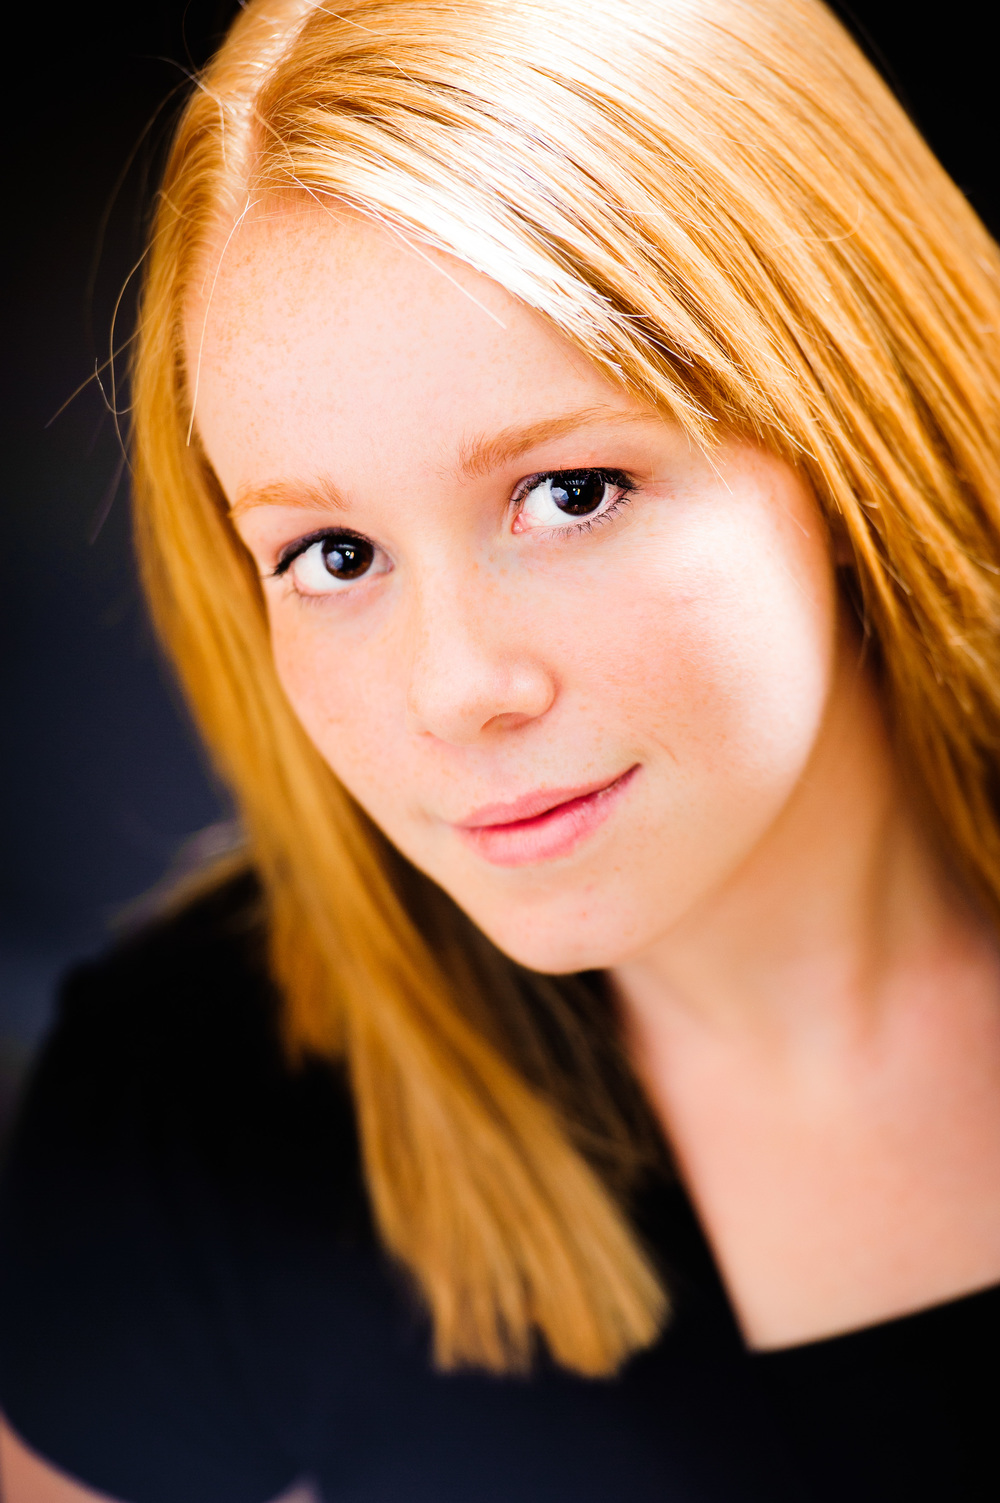 055-BeckyHeadshots-001-DSC_2215.jpg